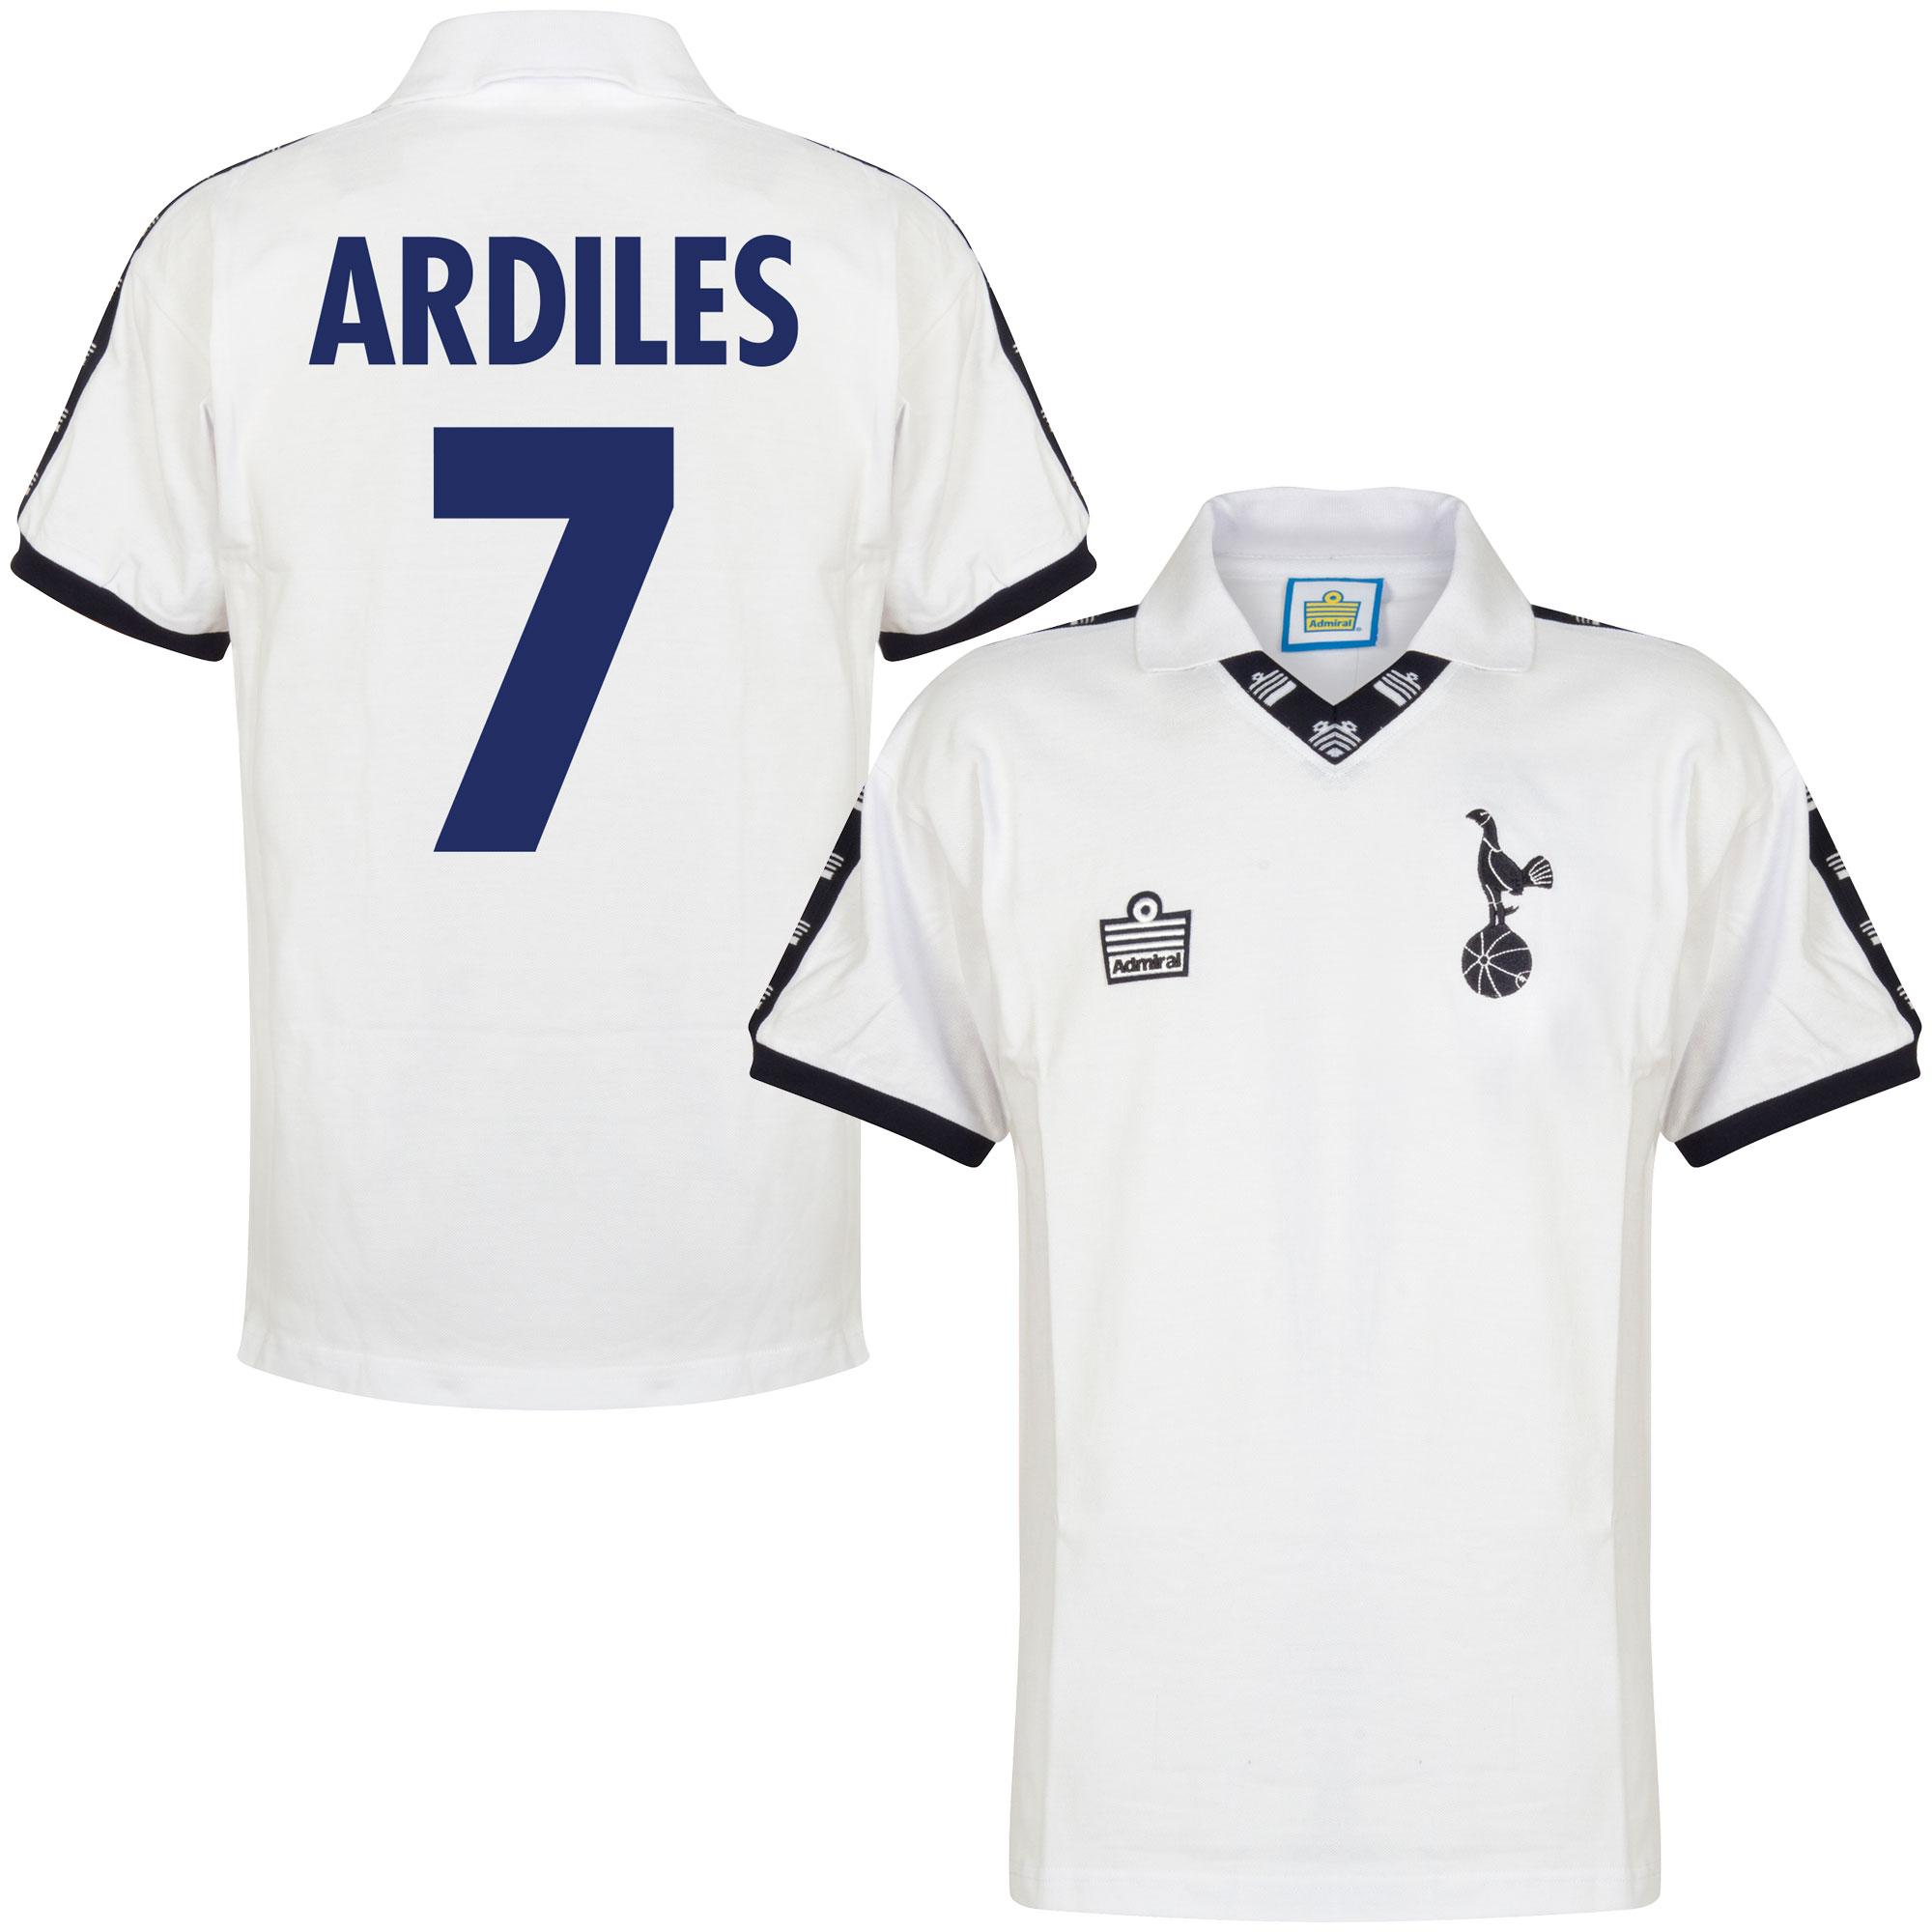 Admiral Tottenham Hotspur Home Ardiles 7 Retro Shirt 1977-1978